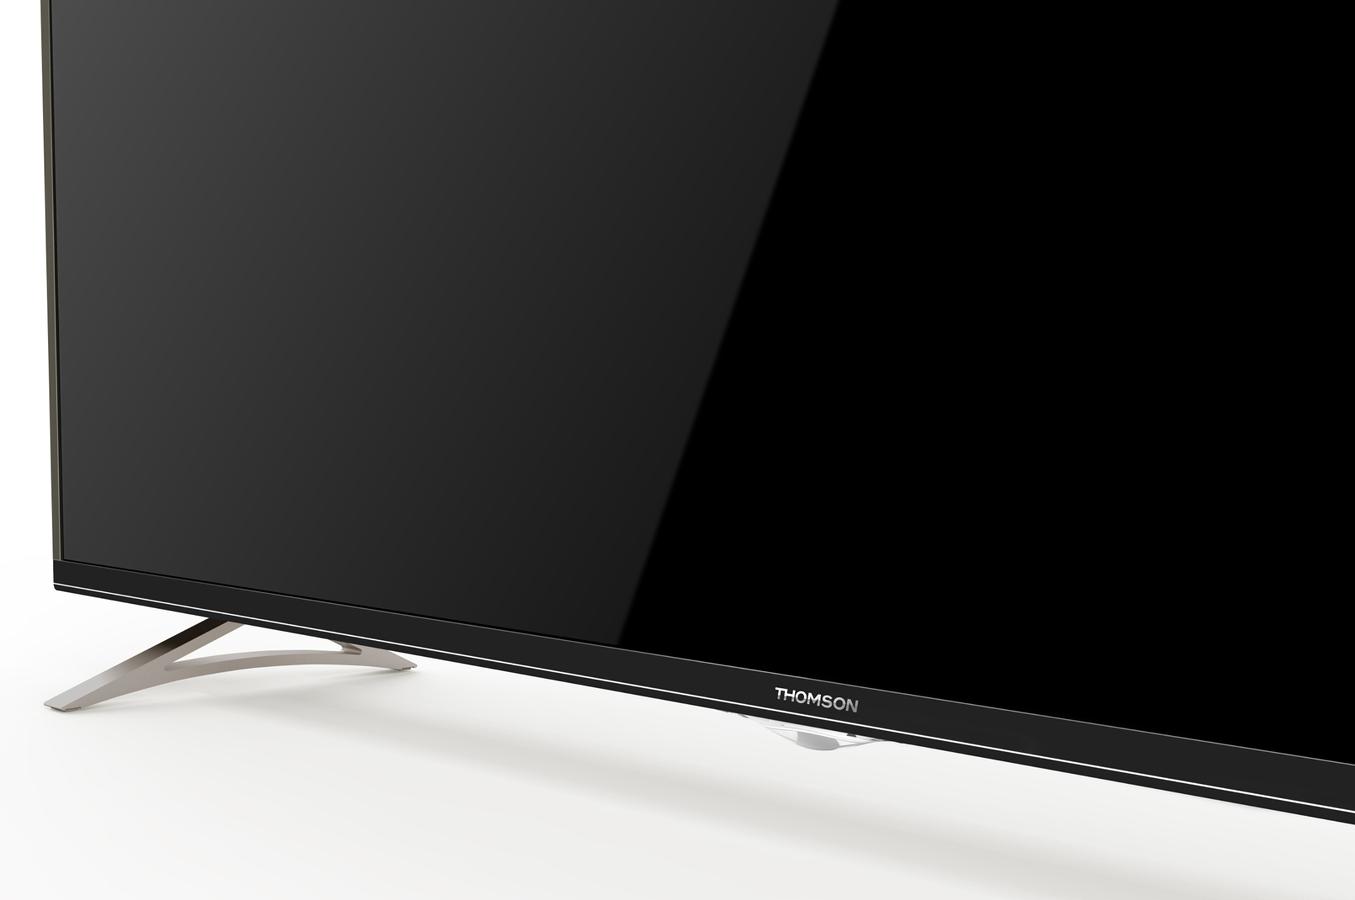 thomson 40ub6406 4k uhd tv tv televiseurs pas chers. Black Bedroom Furniture Sets. Home Design Ideas